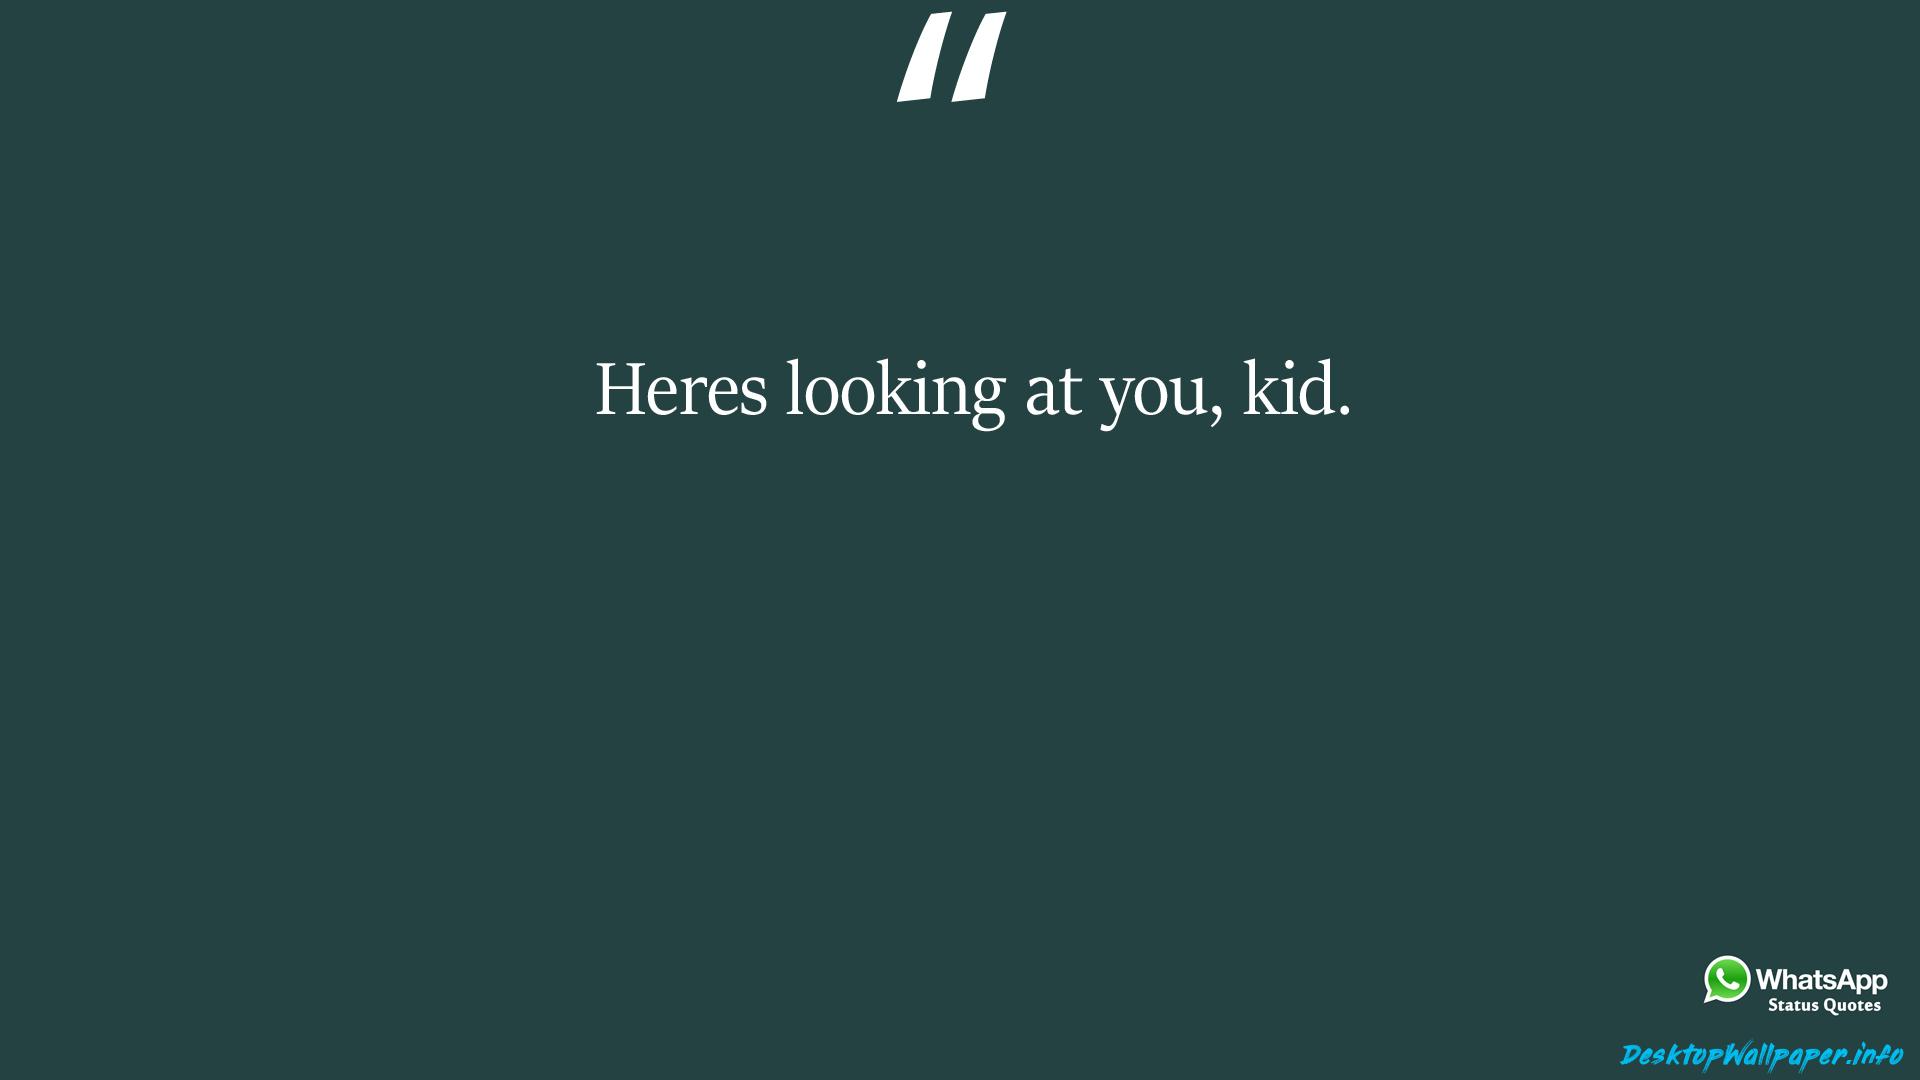 Heres looking at you kid